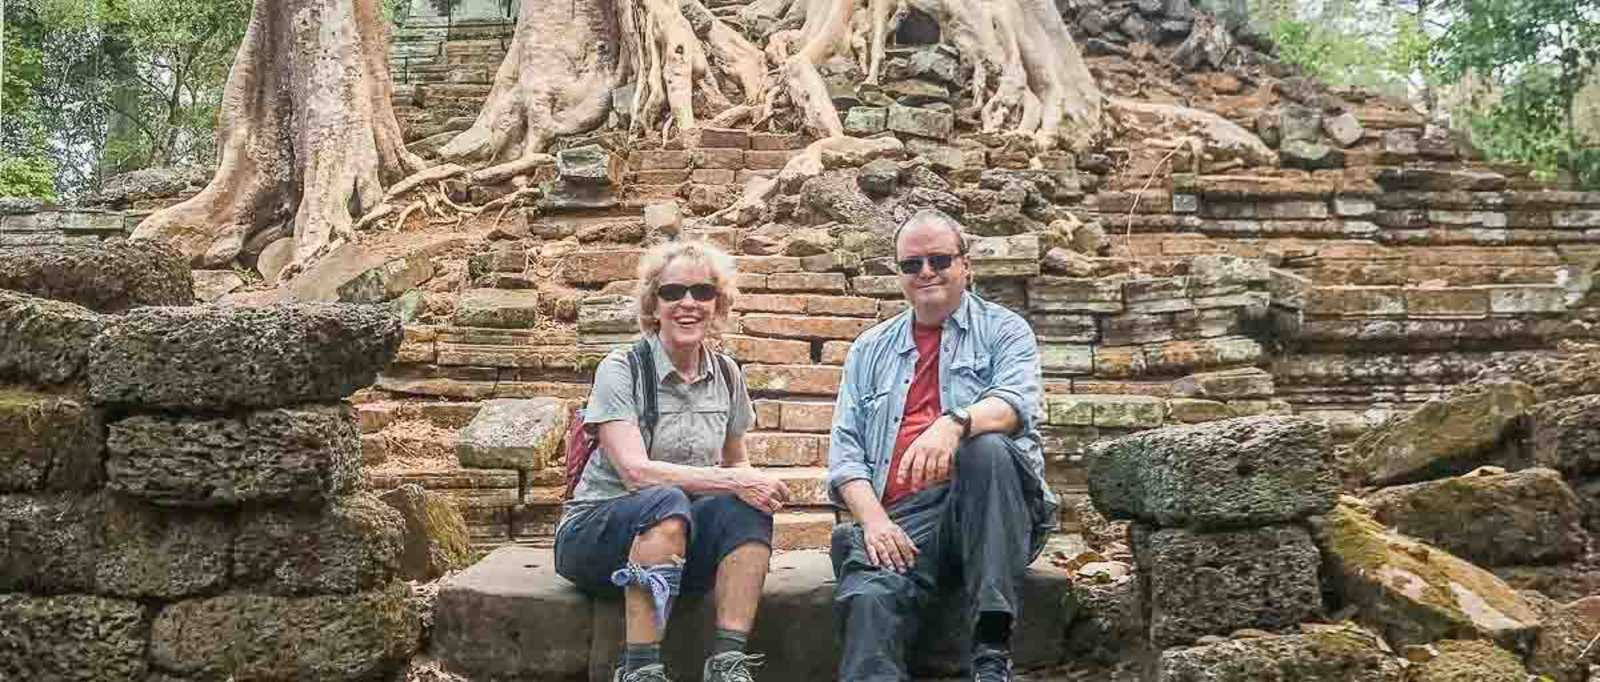 Tailormade Tour of Cambodia